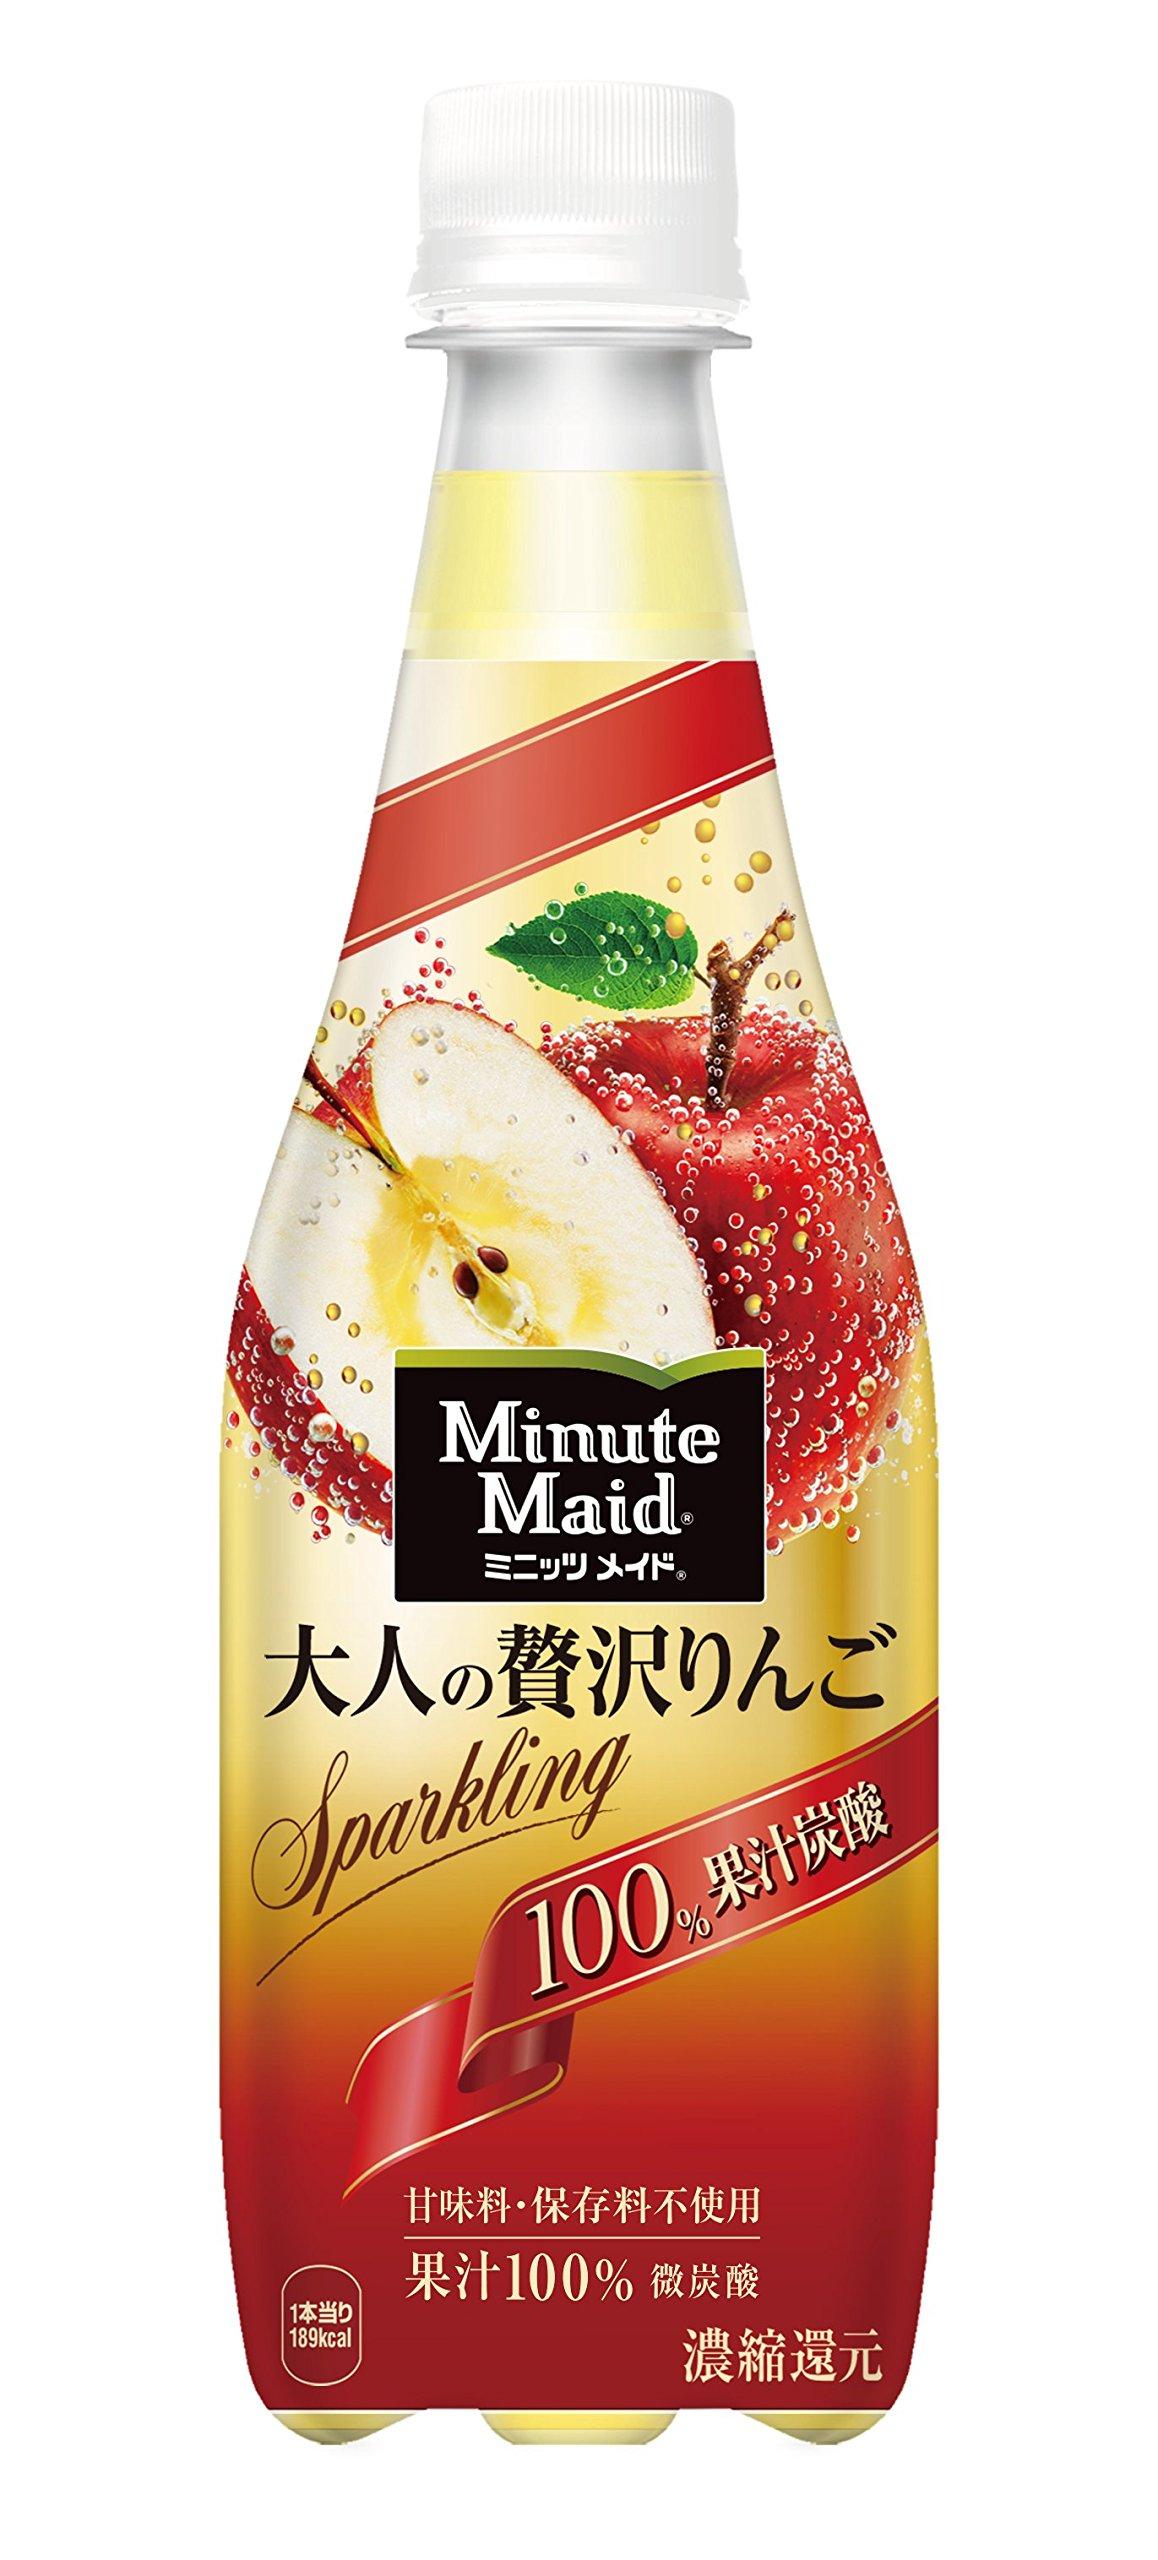 Coca-Cola Minute Maid adult luxury 100% fruit juice carbonate 410ml PETX24 this apple by Minute Maid (Image #1)